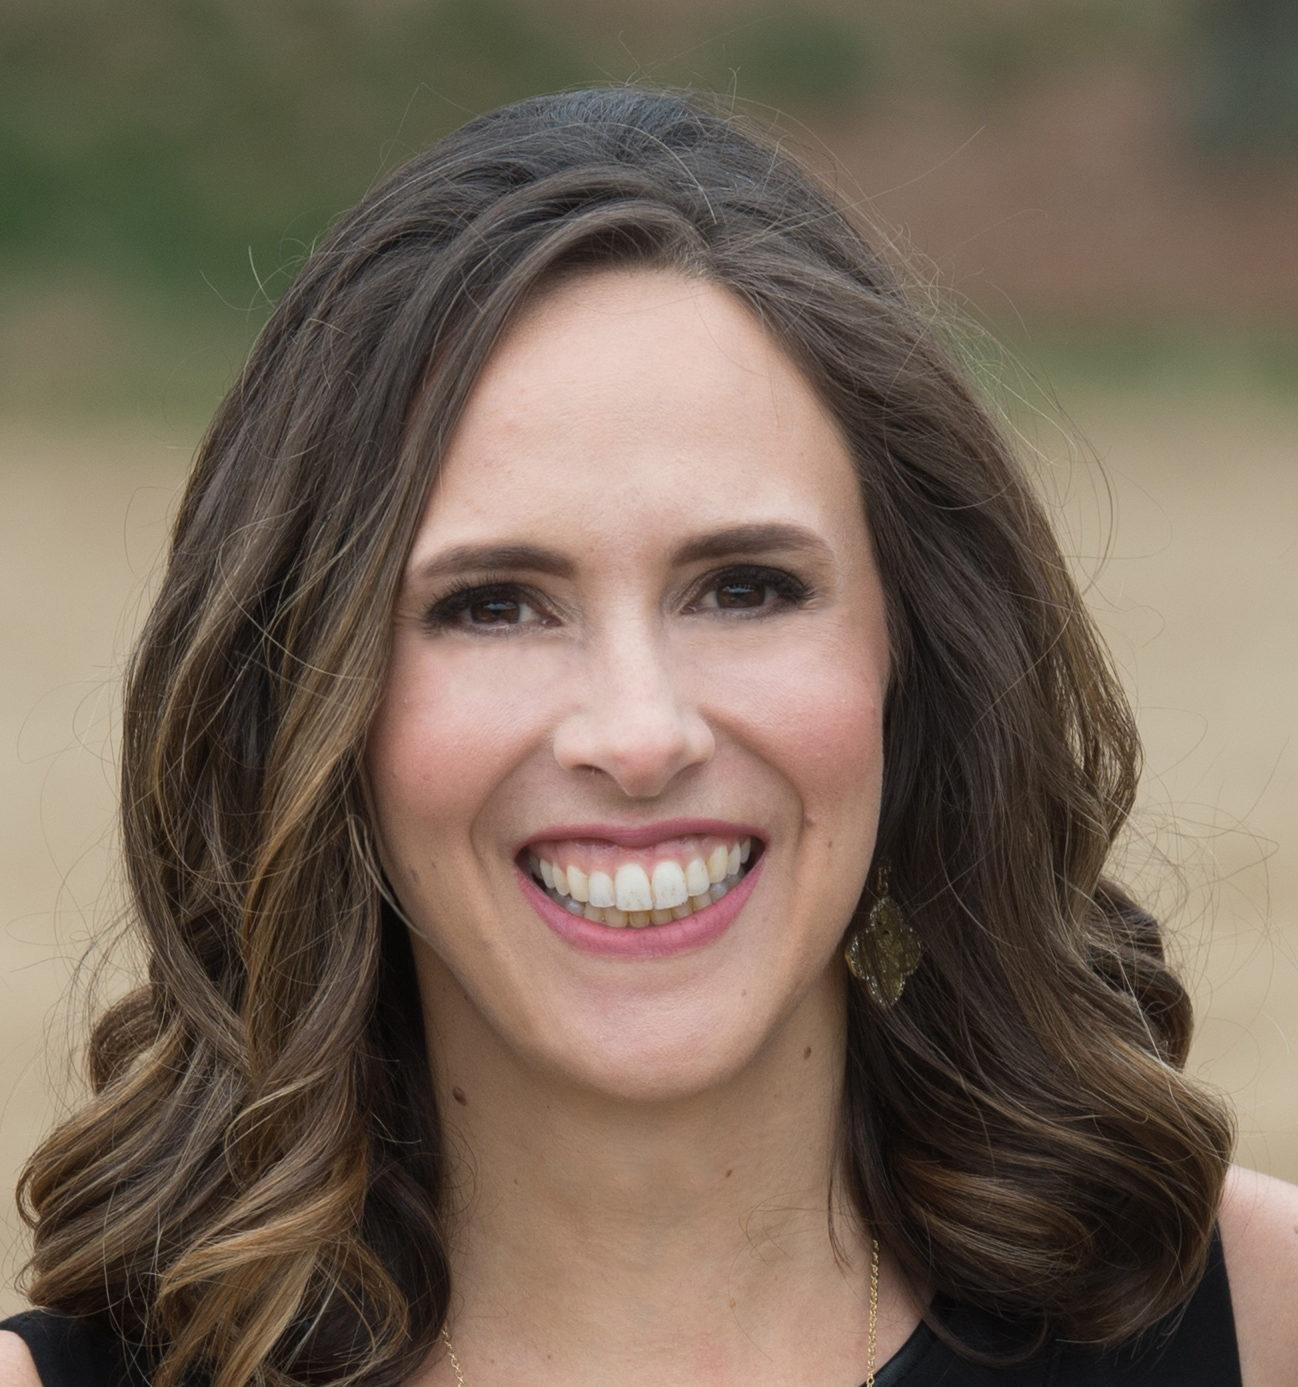 Laura Maddox